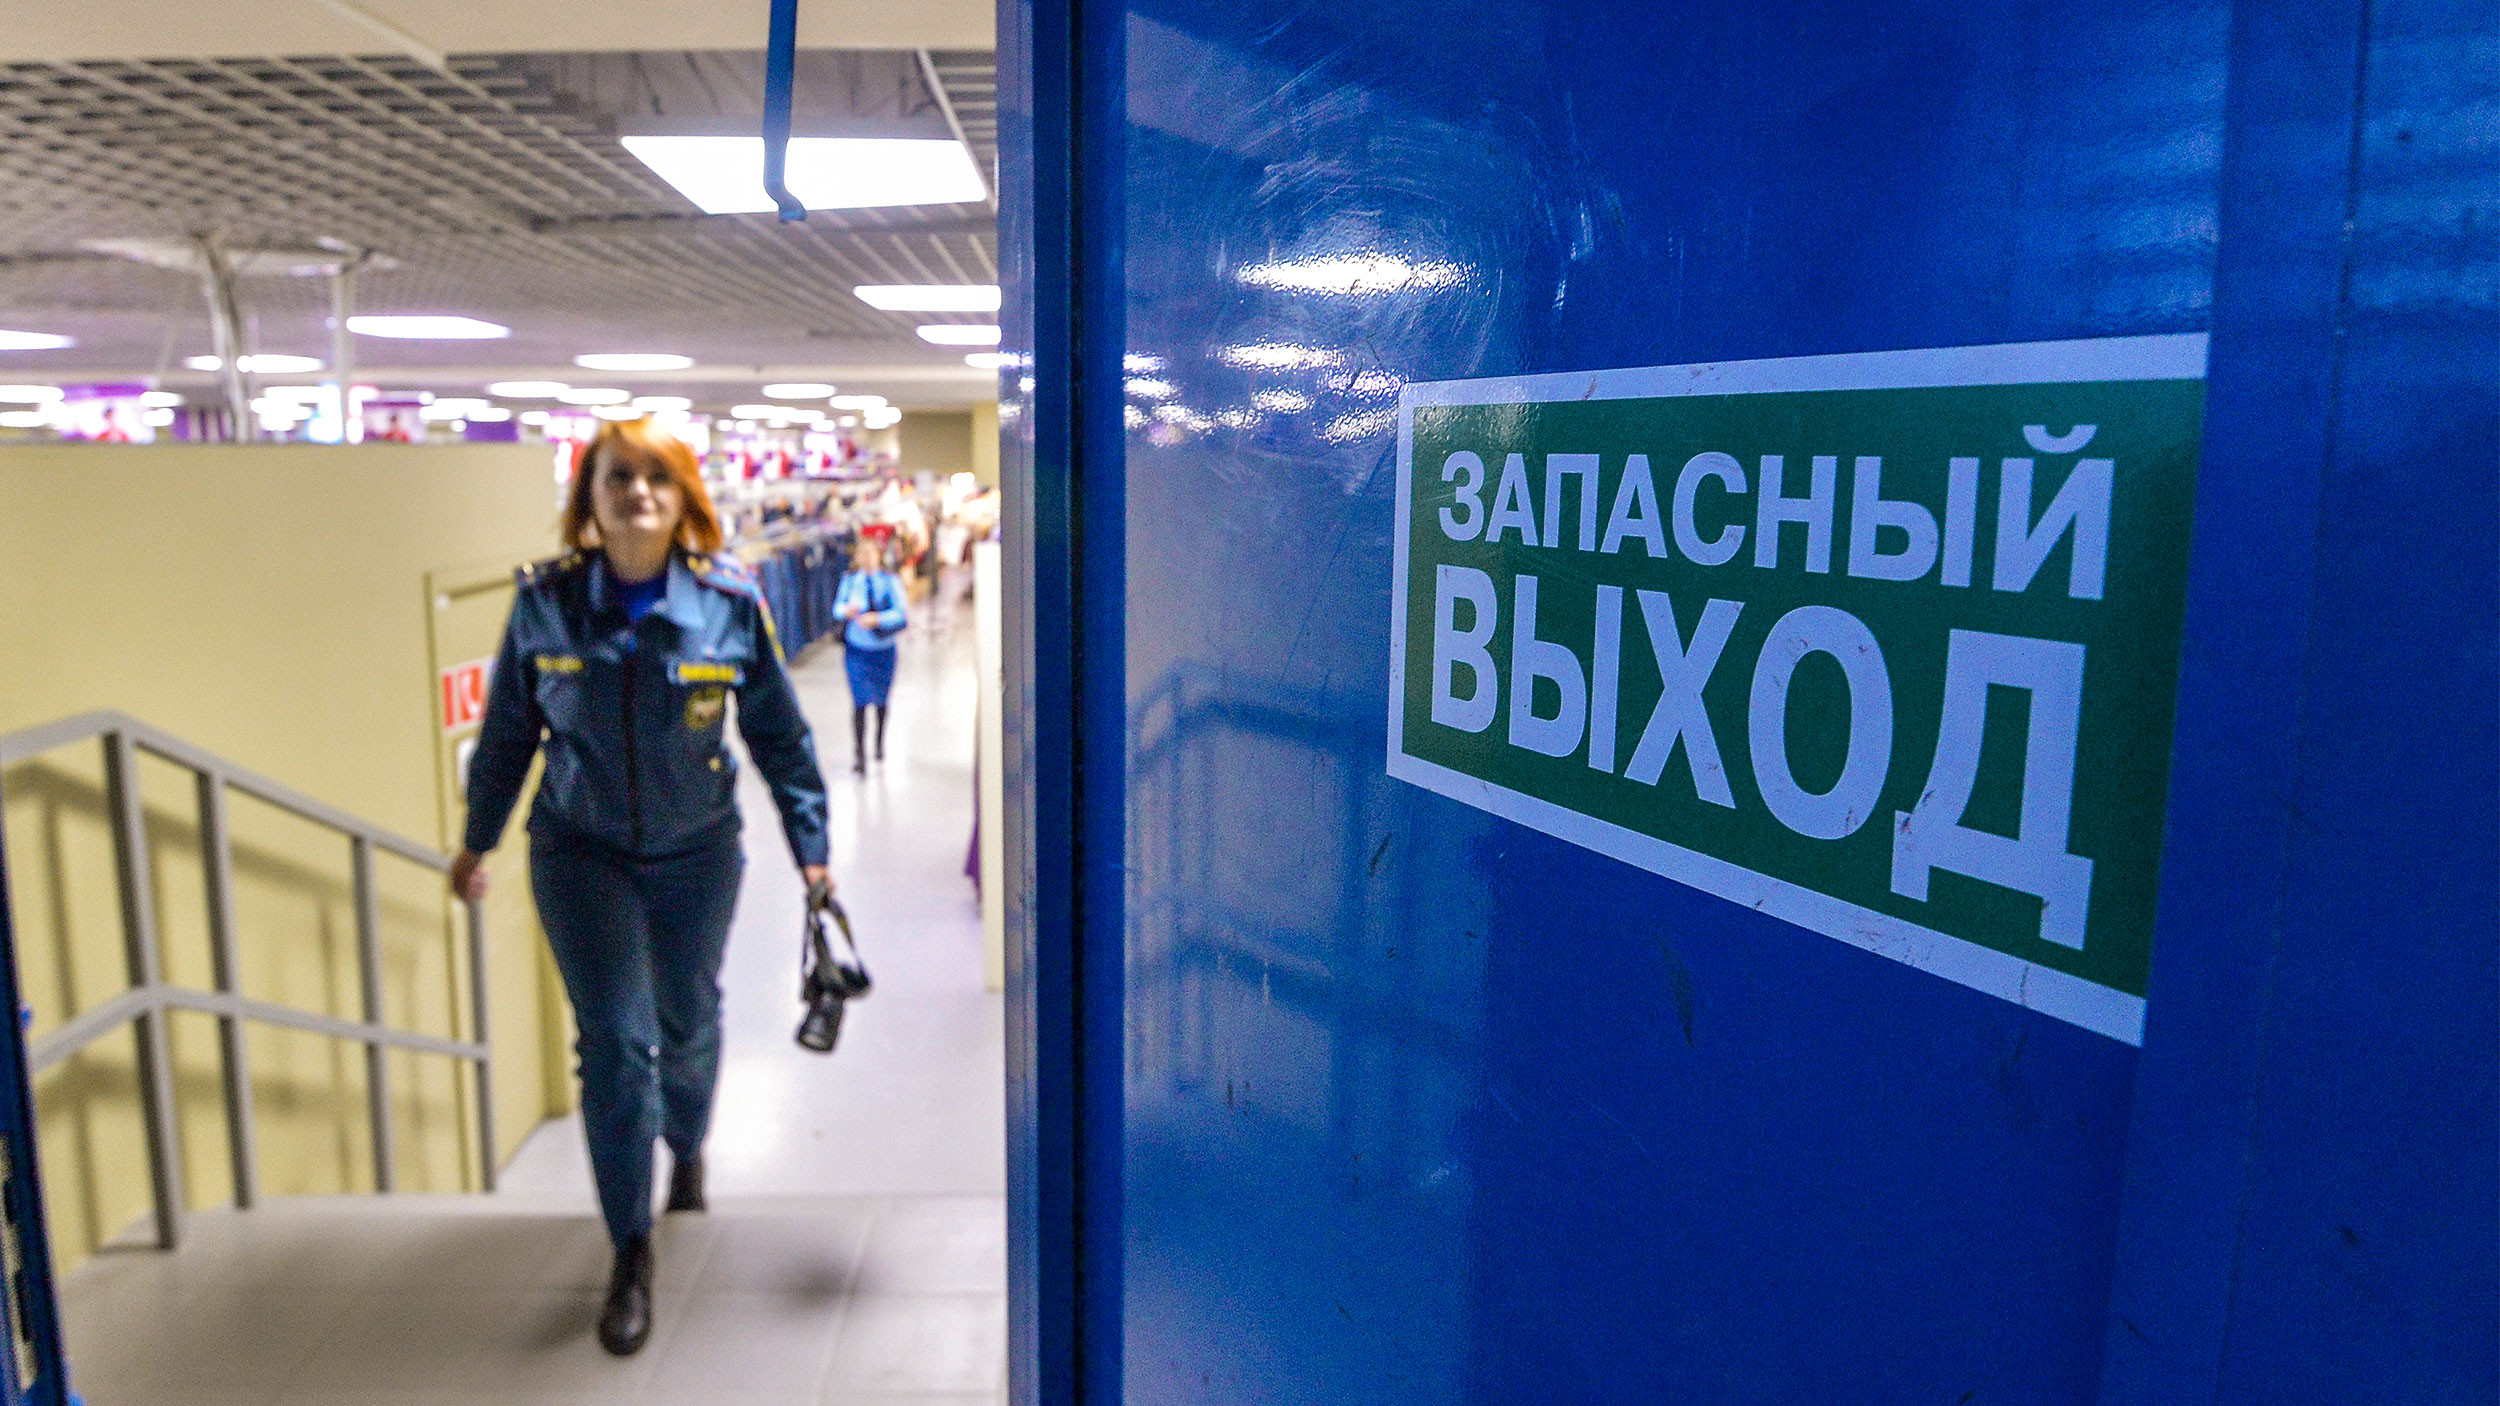 <p>Фото: &copy; РИА Новости/Александр Кондратюк</p>